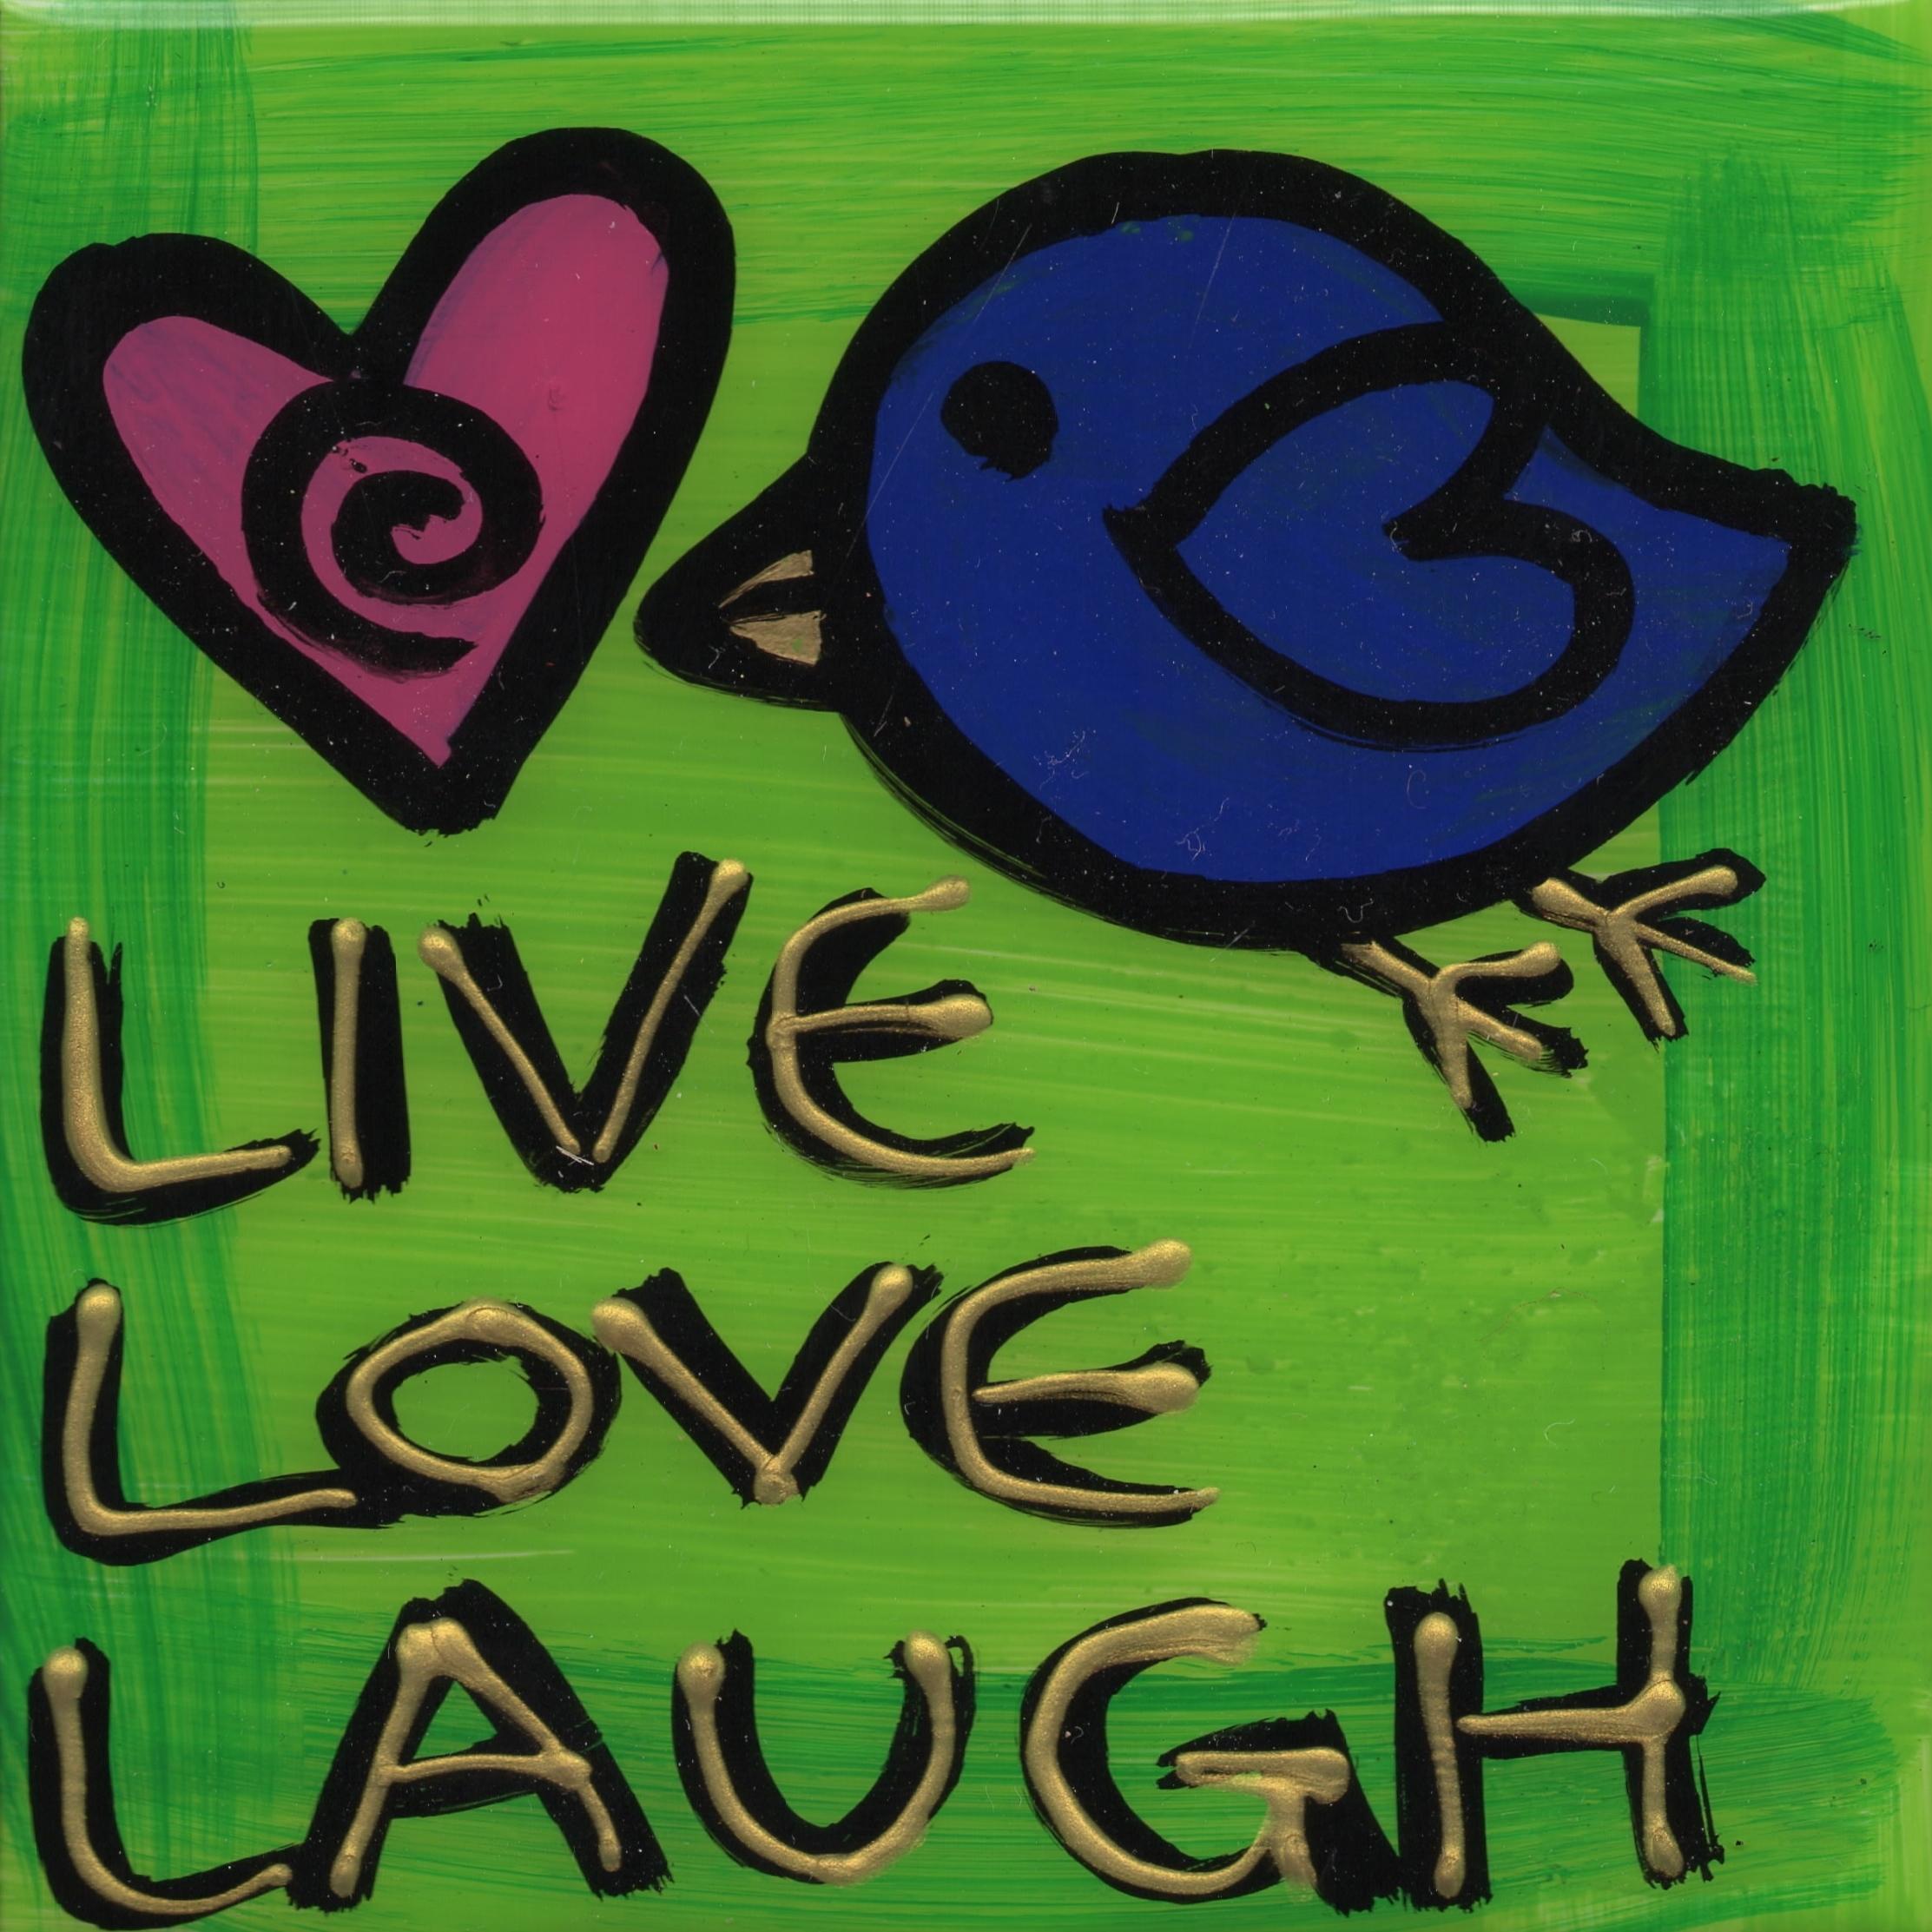 Live Love Laugh 00074